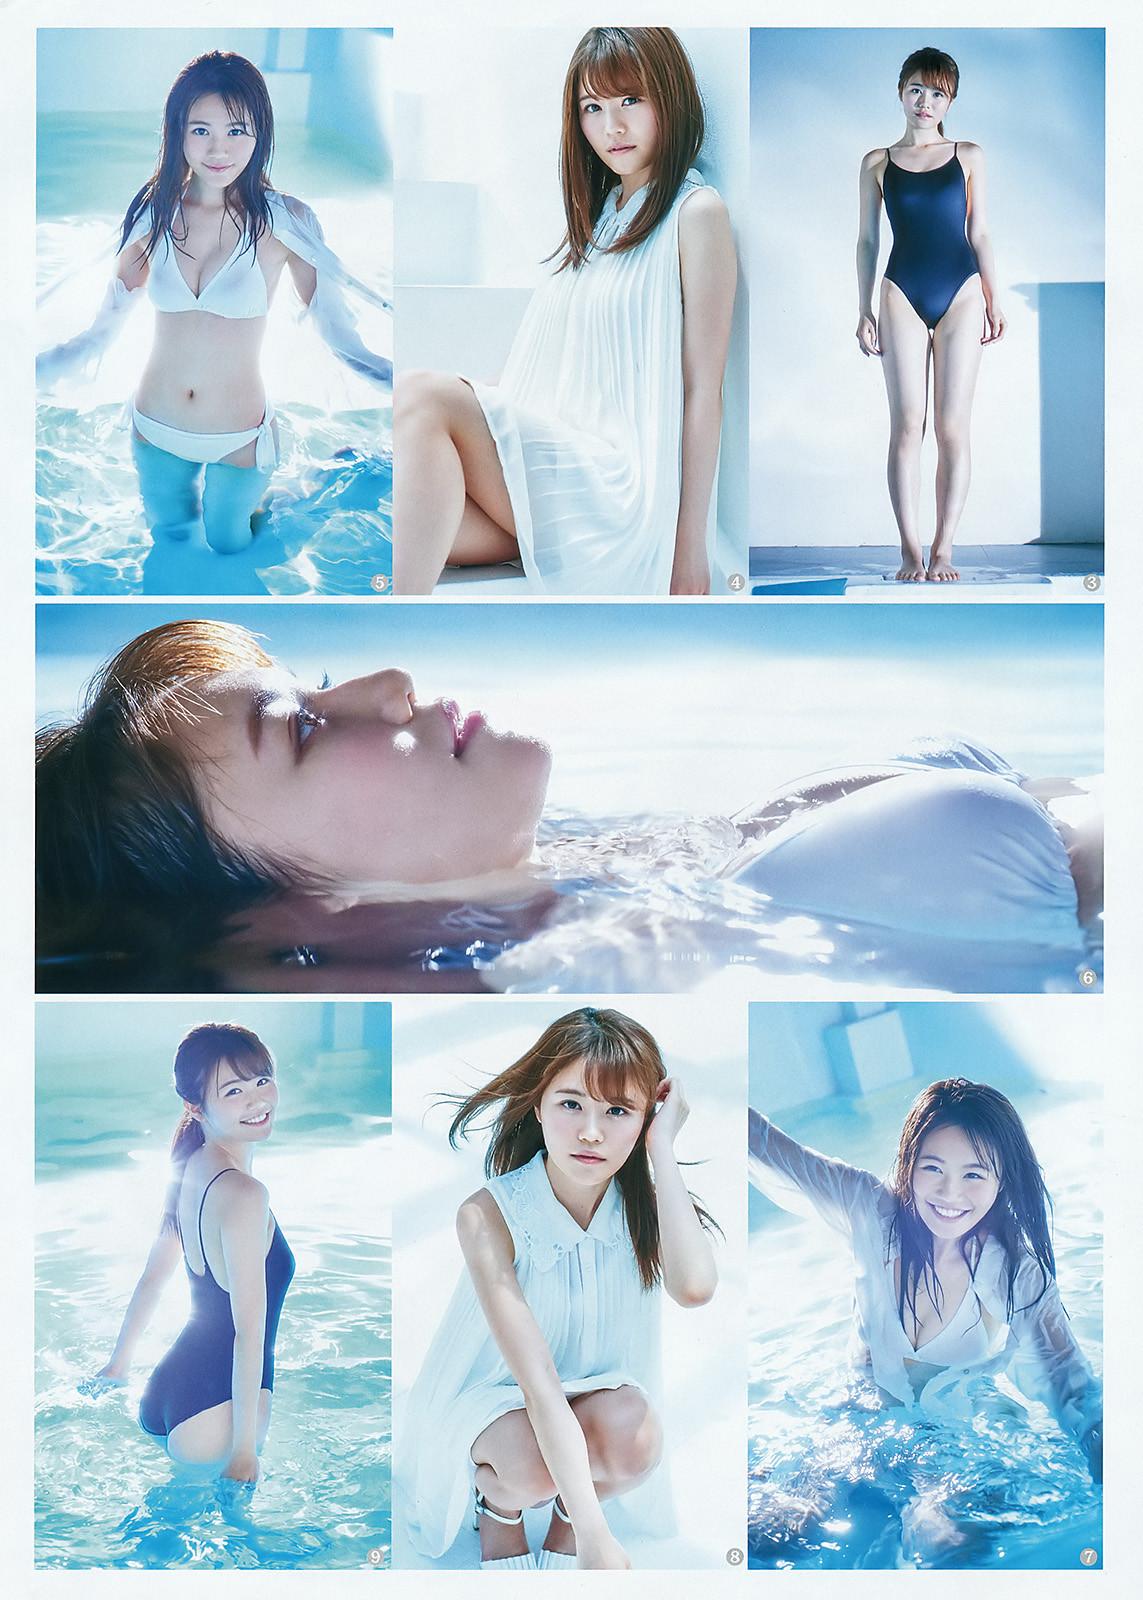 Komiyama Haruka 込山榛香 AKB48, Weekly Young Jump 2016 No.29 Gravure